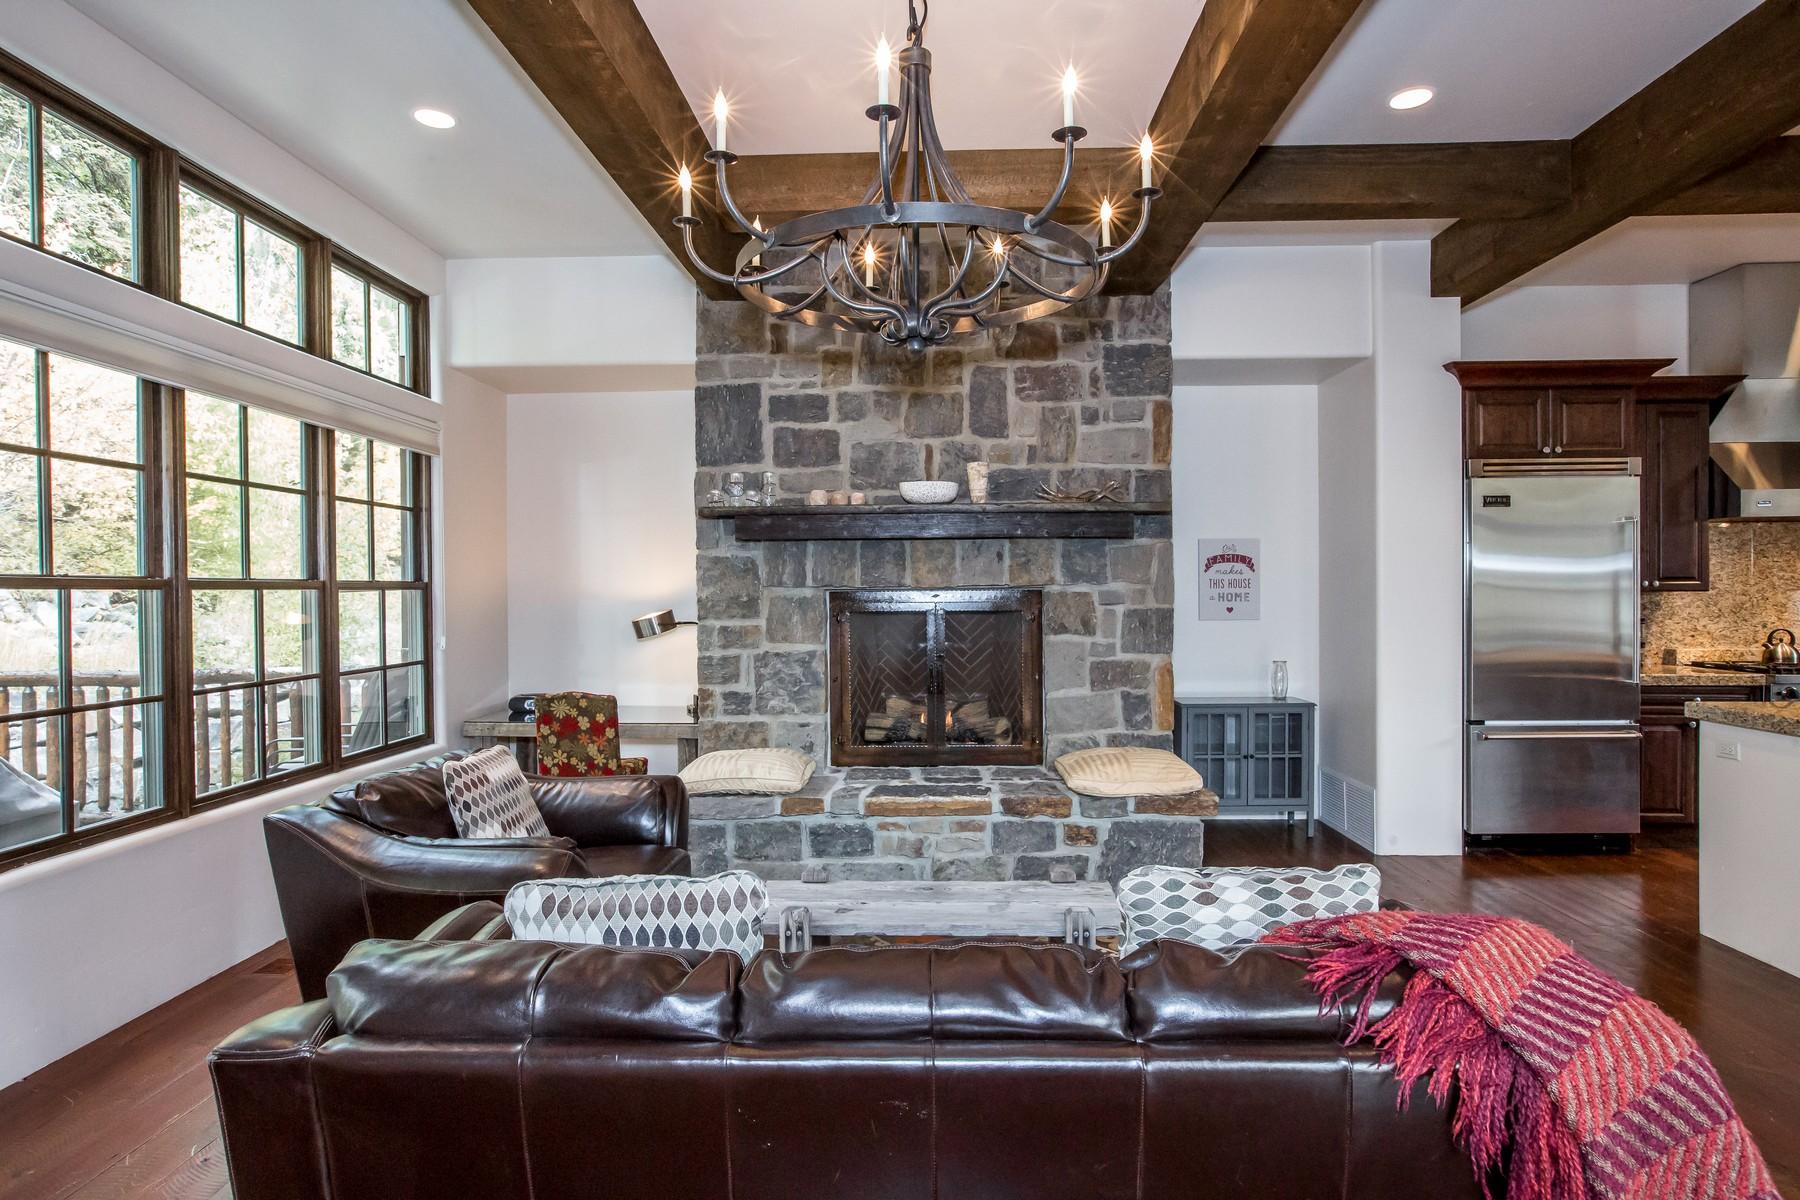 Condominium for Sale at 71 Slopeside Dr , Whitefish, MT 59937 71 Slopeside Dr Whitefish Mountain Resort, Whitefish, Montana, 59937 United States